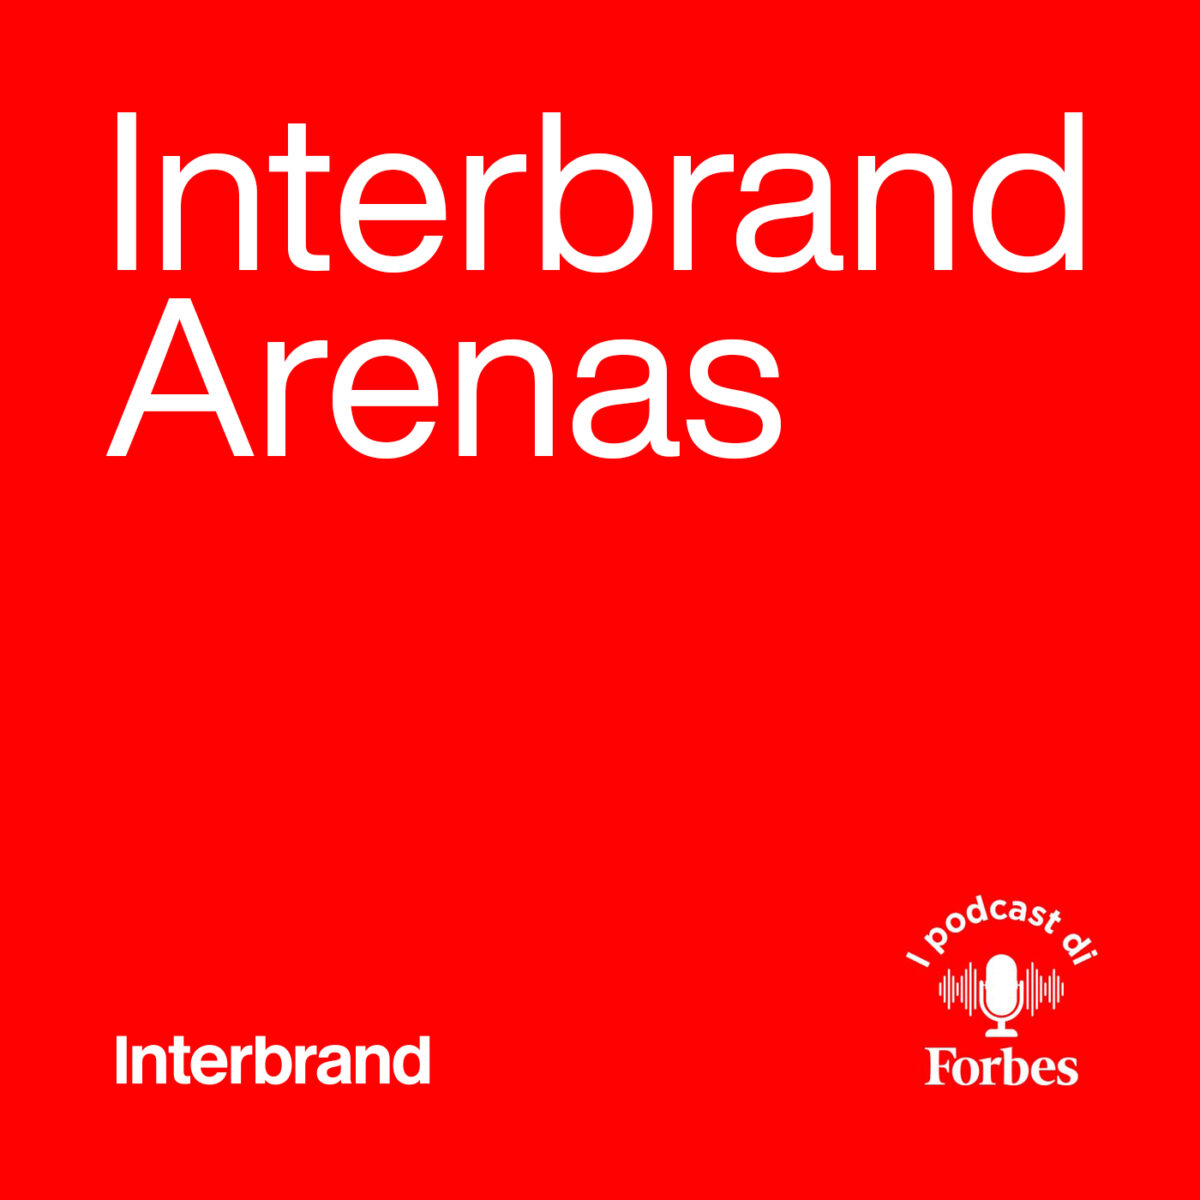 Interbrand Arenas